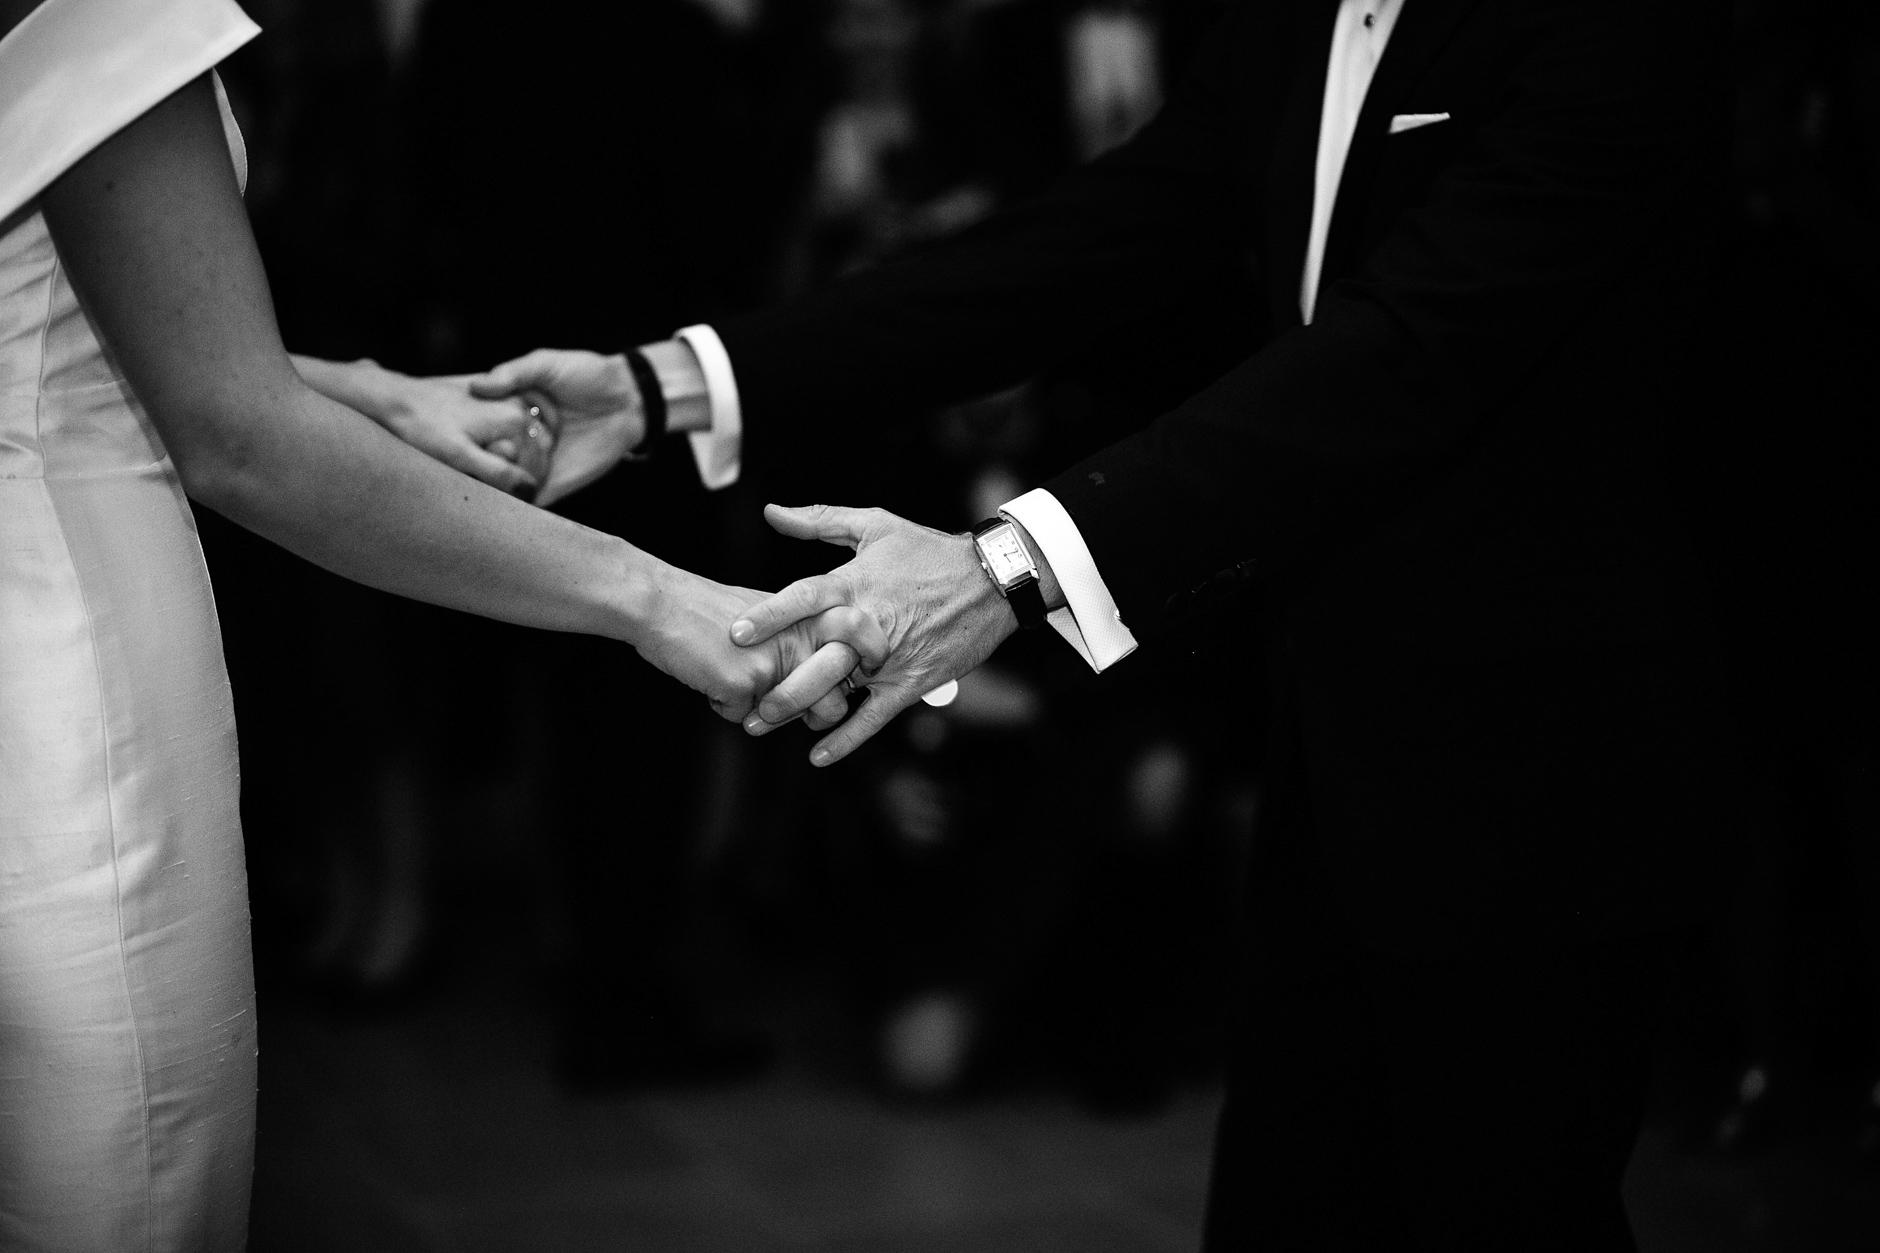 Glentruim-Wedding-Nikki-Leadbetter-Photography-375.jpg